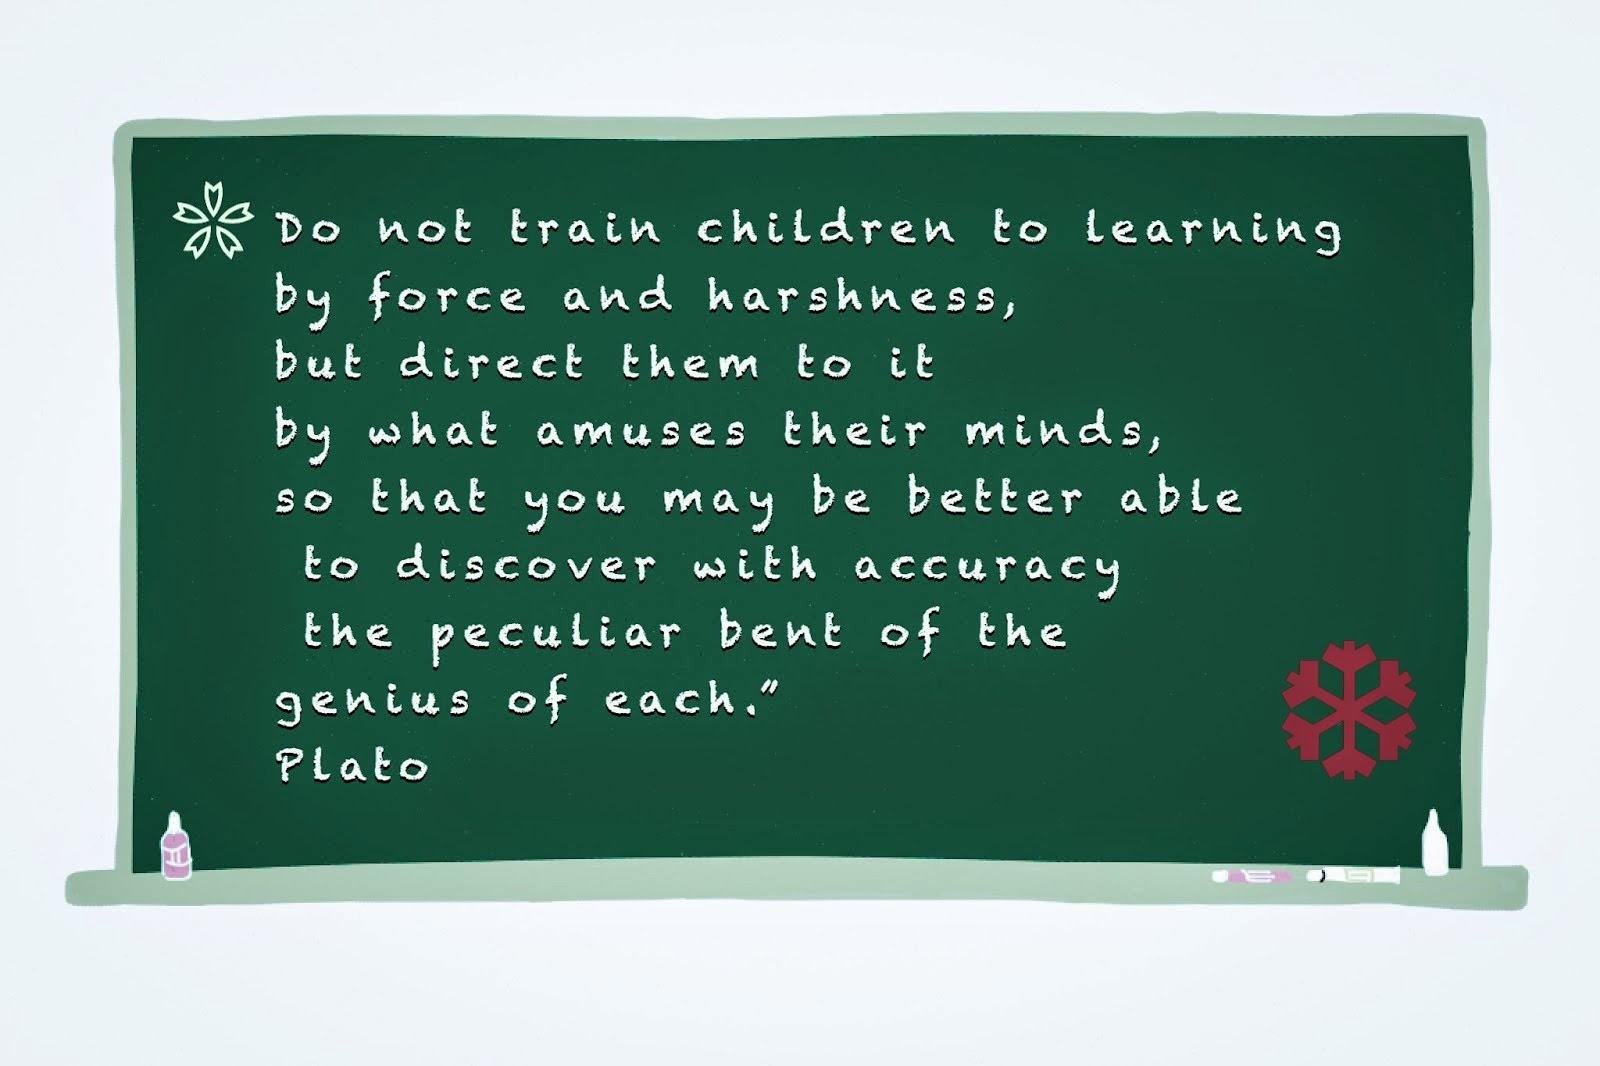 Plato Sez: